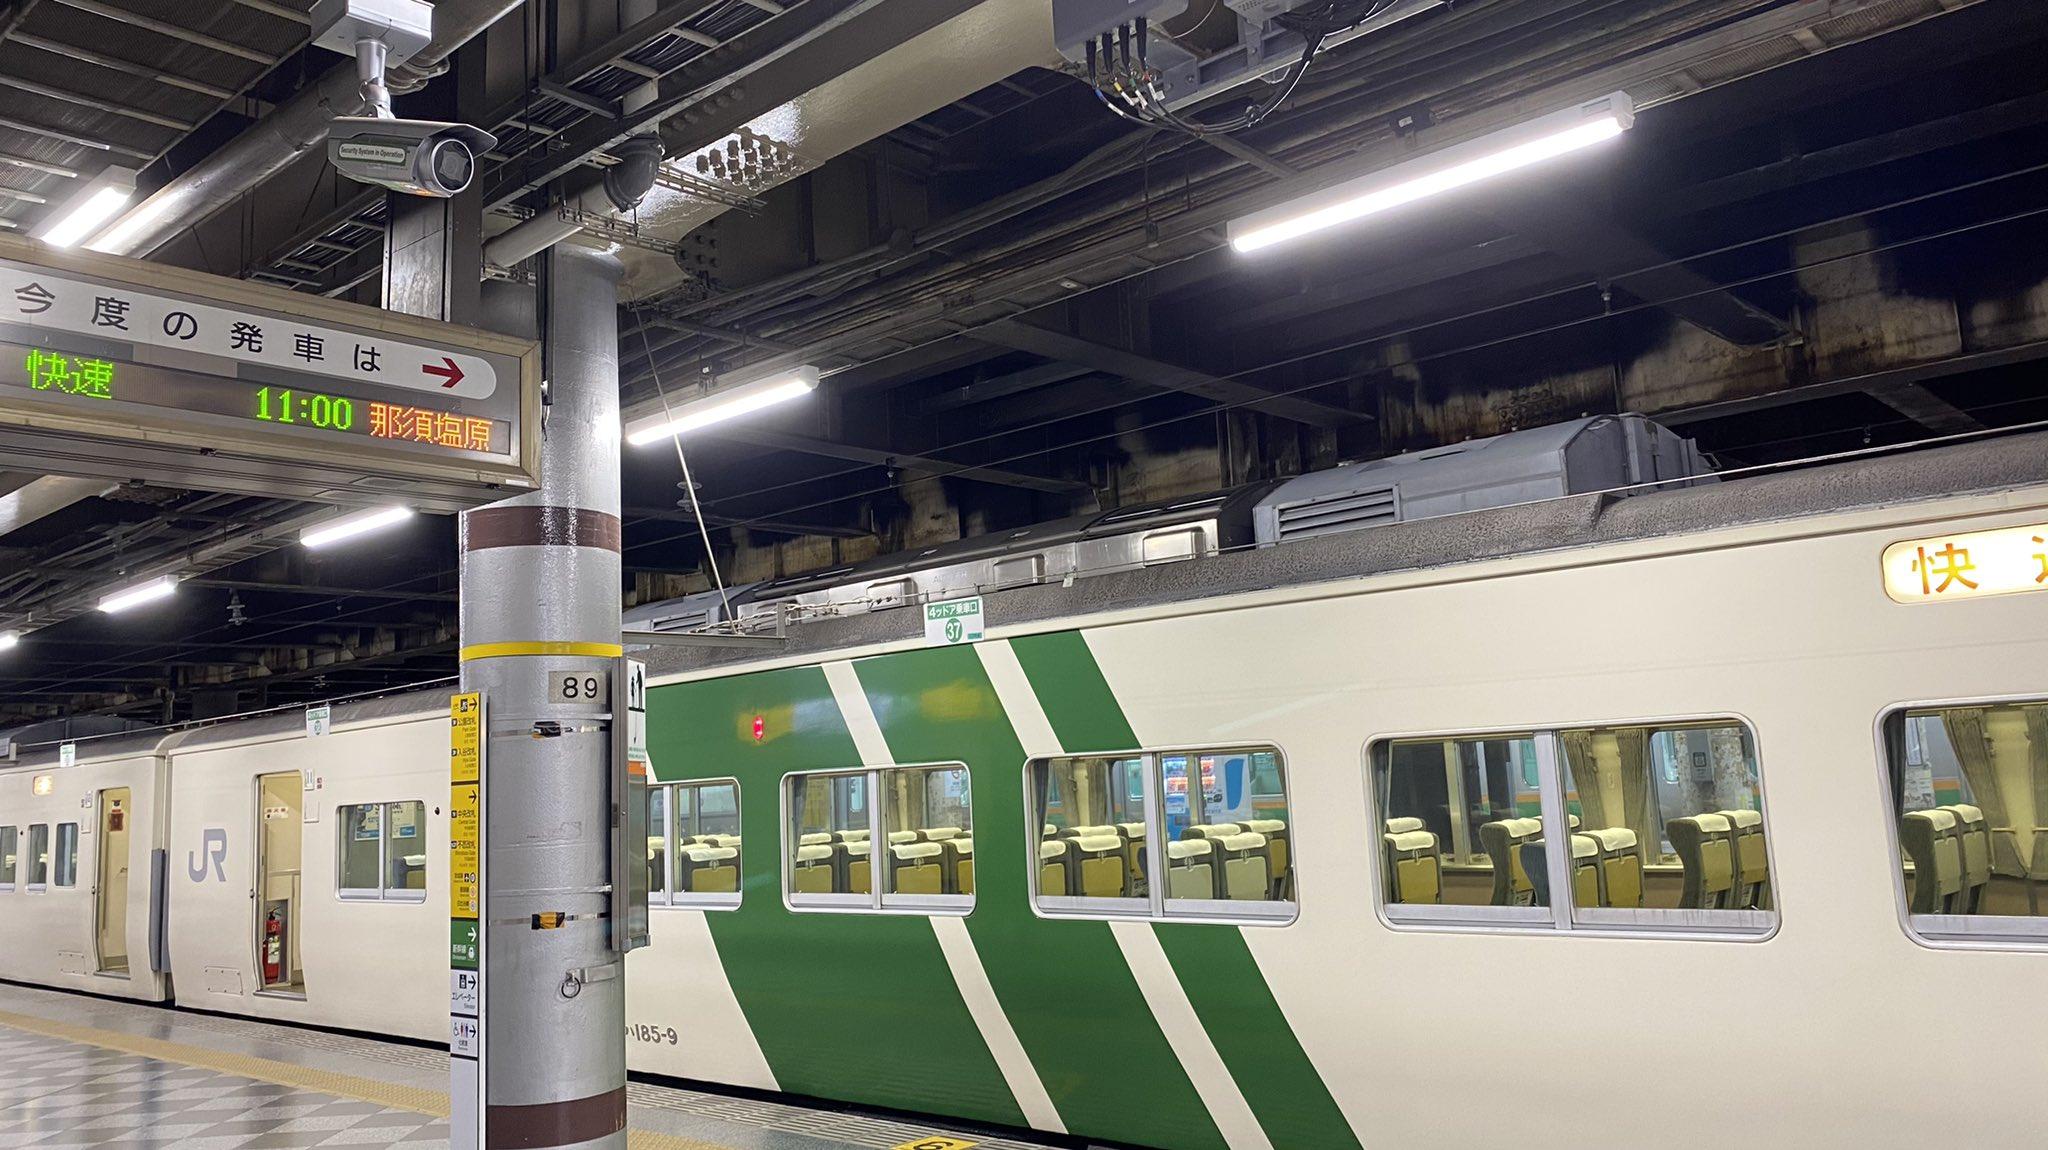 【JR東日本】185系で上野発那須塩原行の臨時快速運転 東北新幹線救済列車